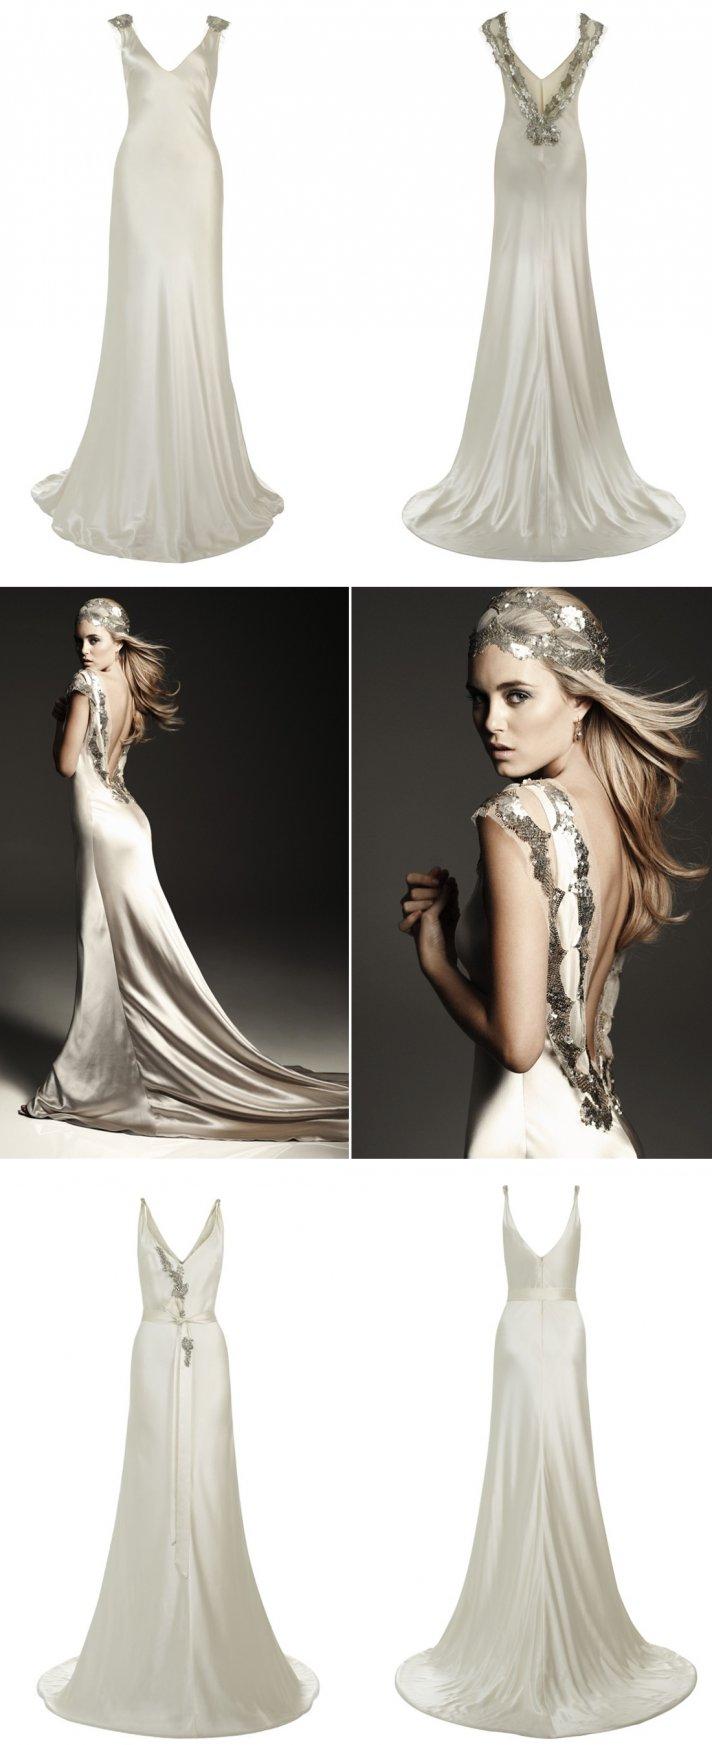 JOHANNA JOHNSON WEDDING DRESSES 2012 BRIDAL GOWN